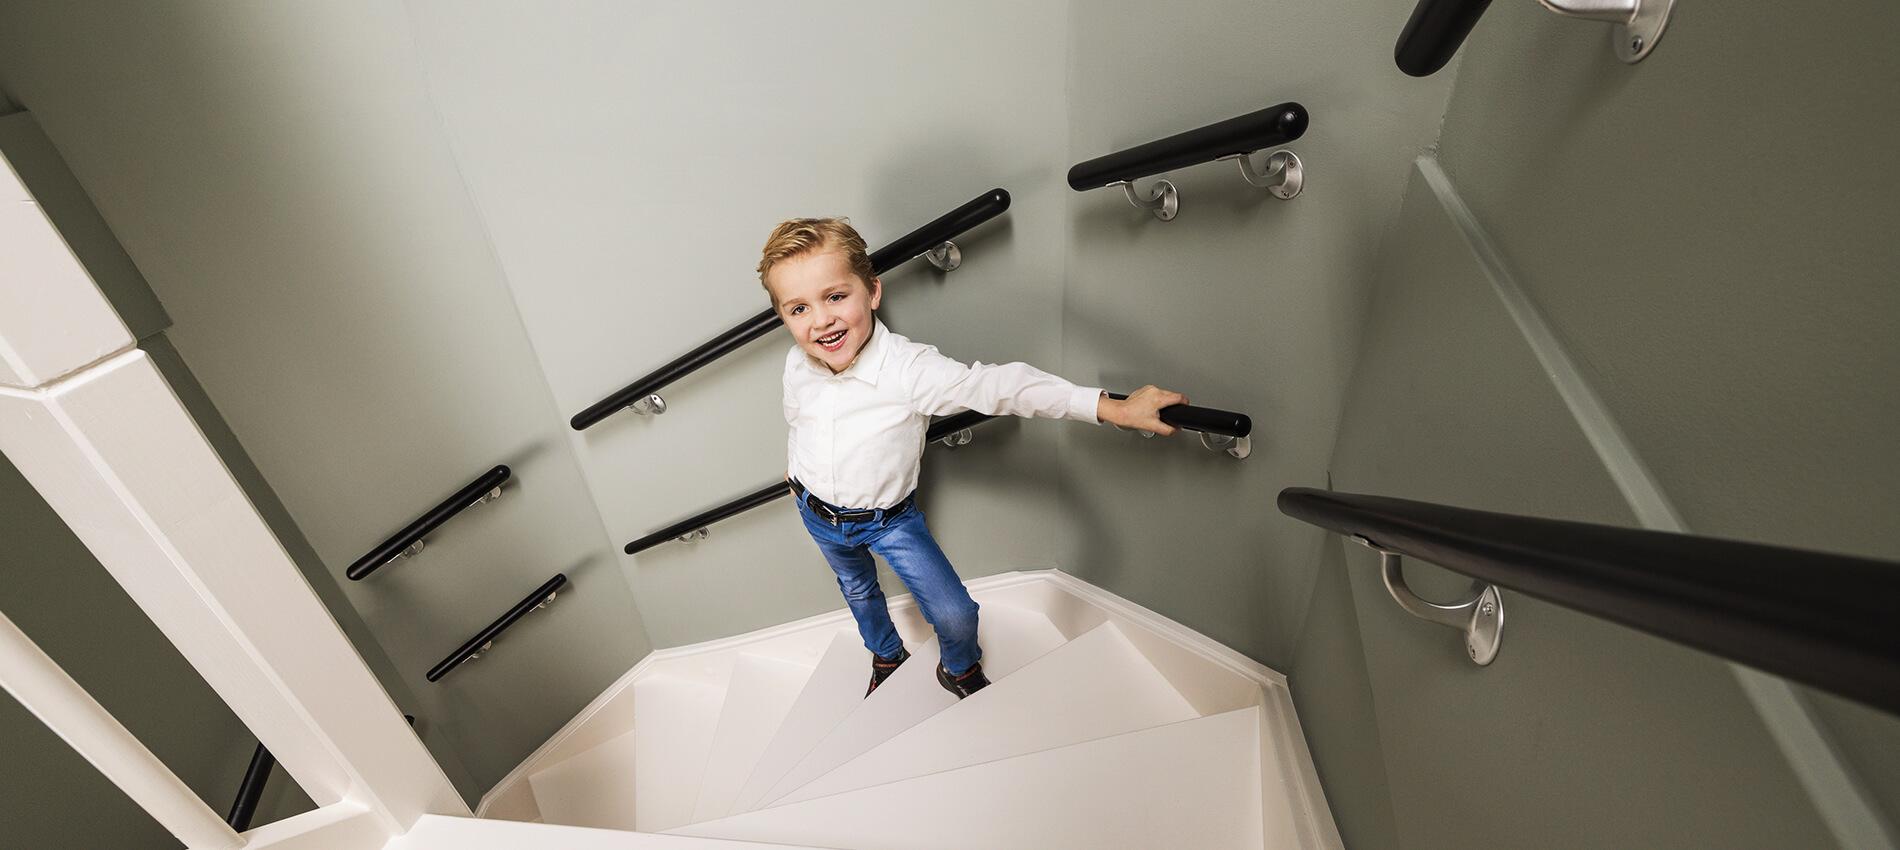 kindertrapleuning-veilig-duurzaam-2